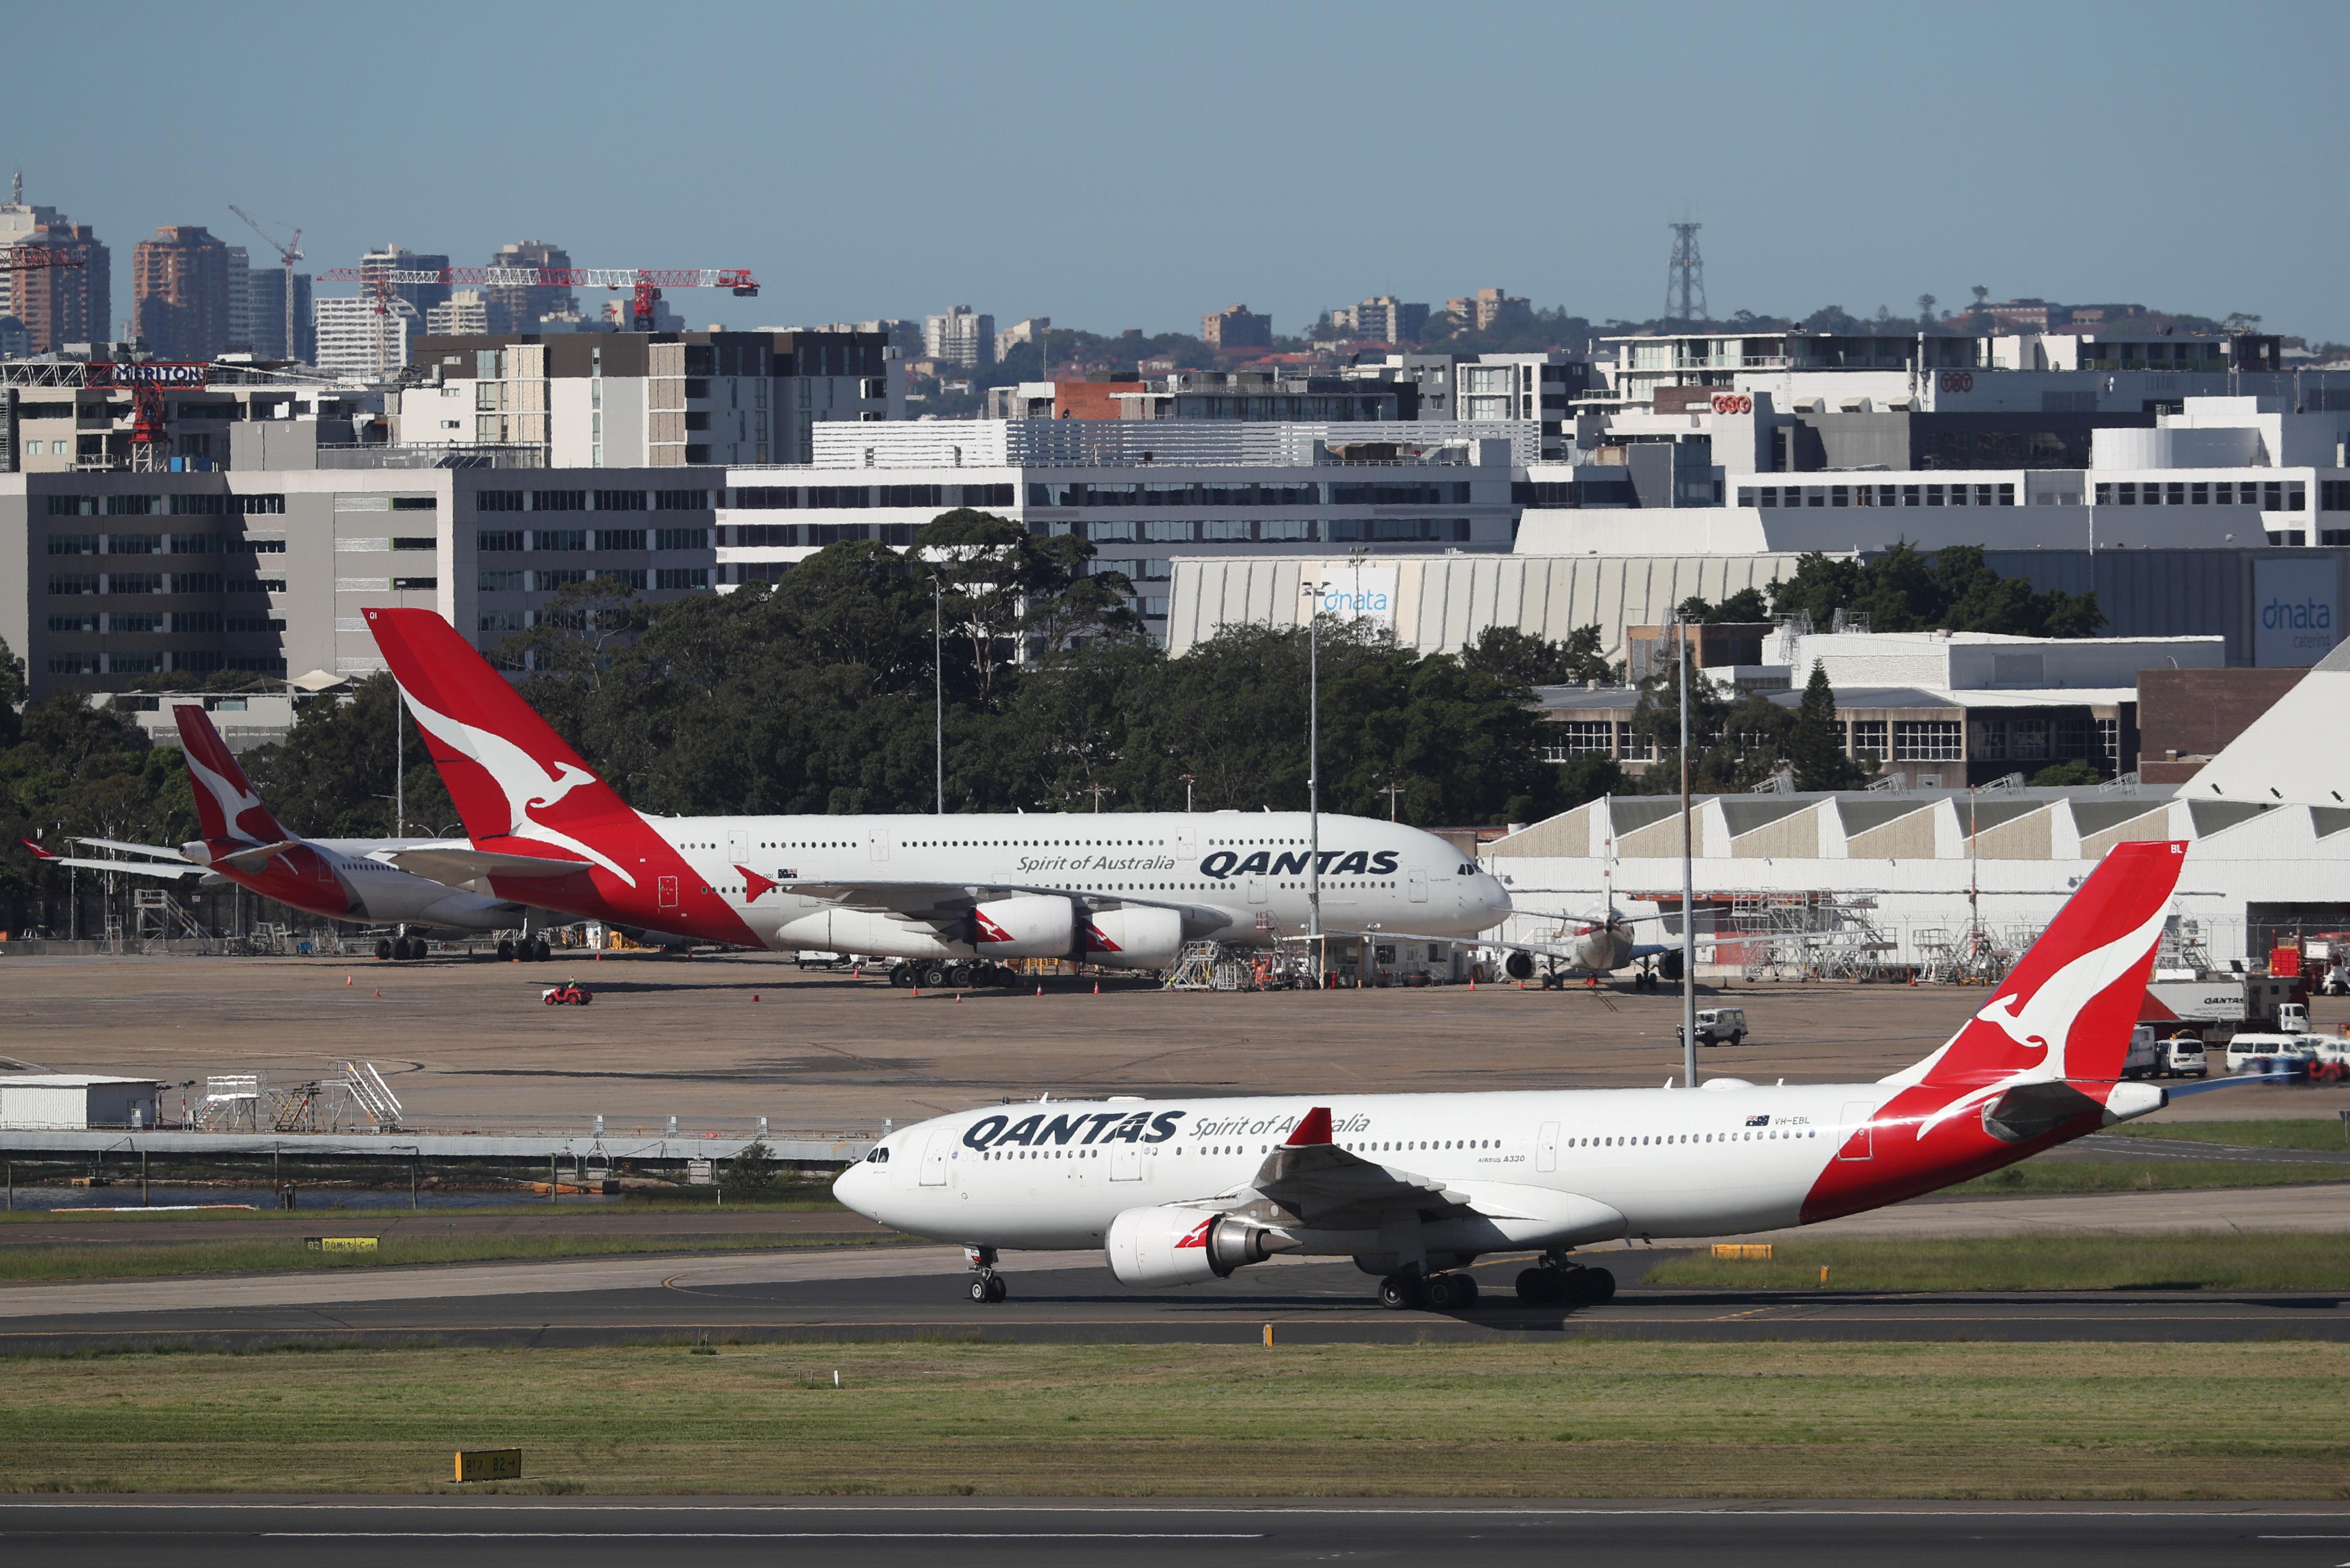 Qantas planes are seen at Kingsford Smith International Airport, following the coronavirus outbreak, in Sydney, Australia, March 18, 2020.  REUTERS/Loren Elliott